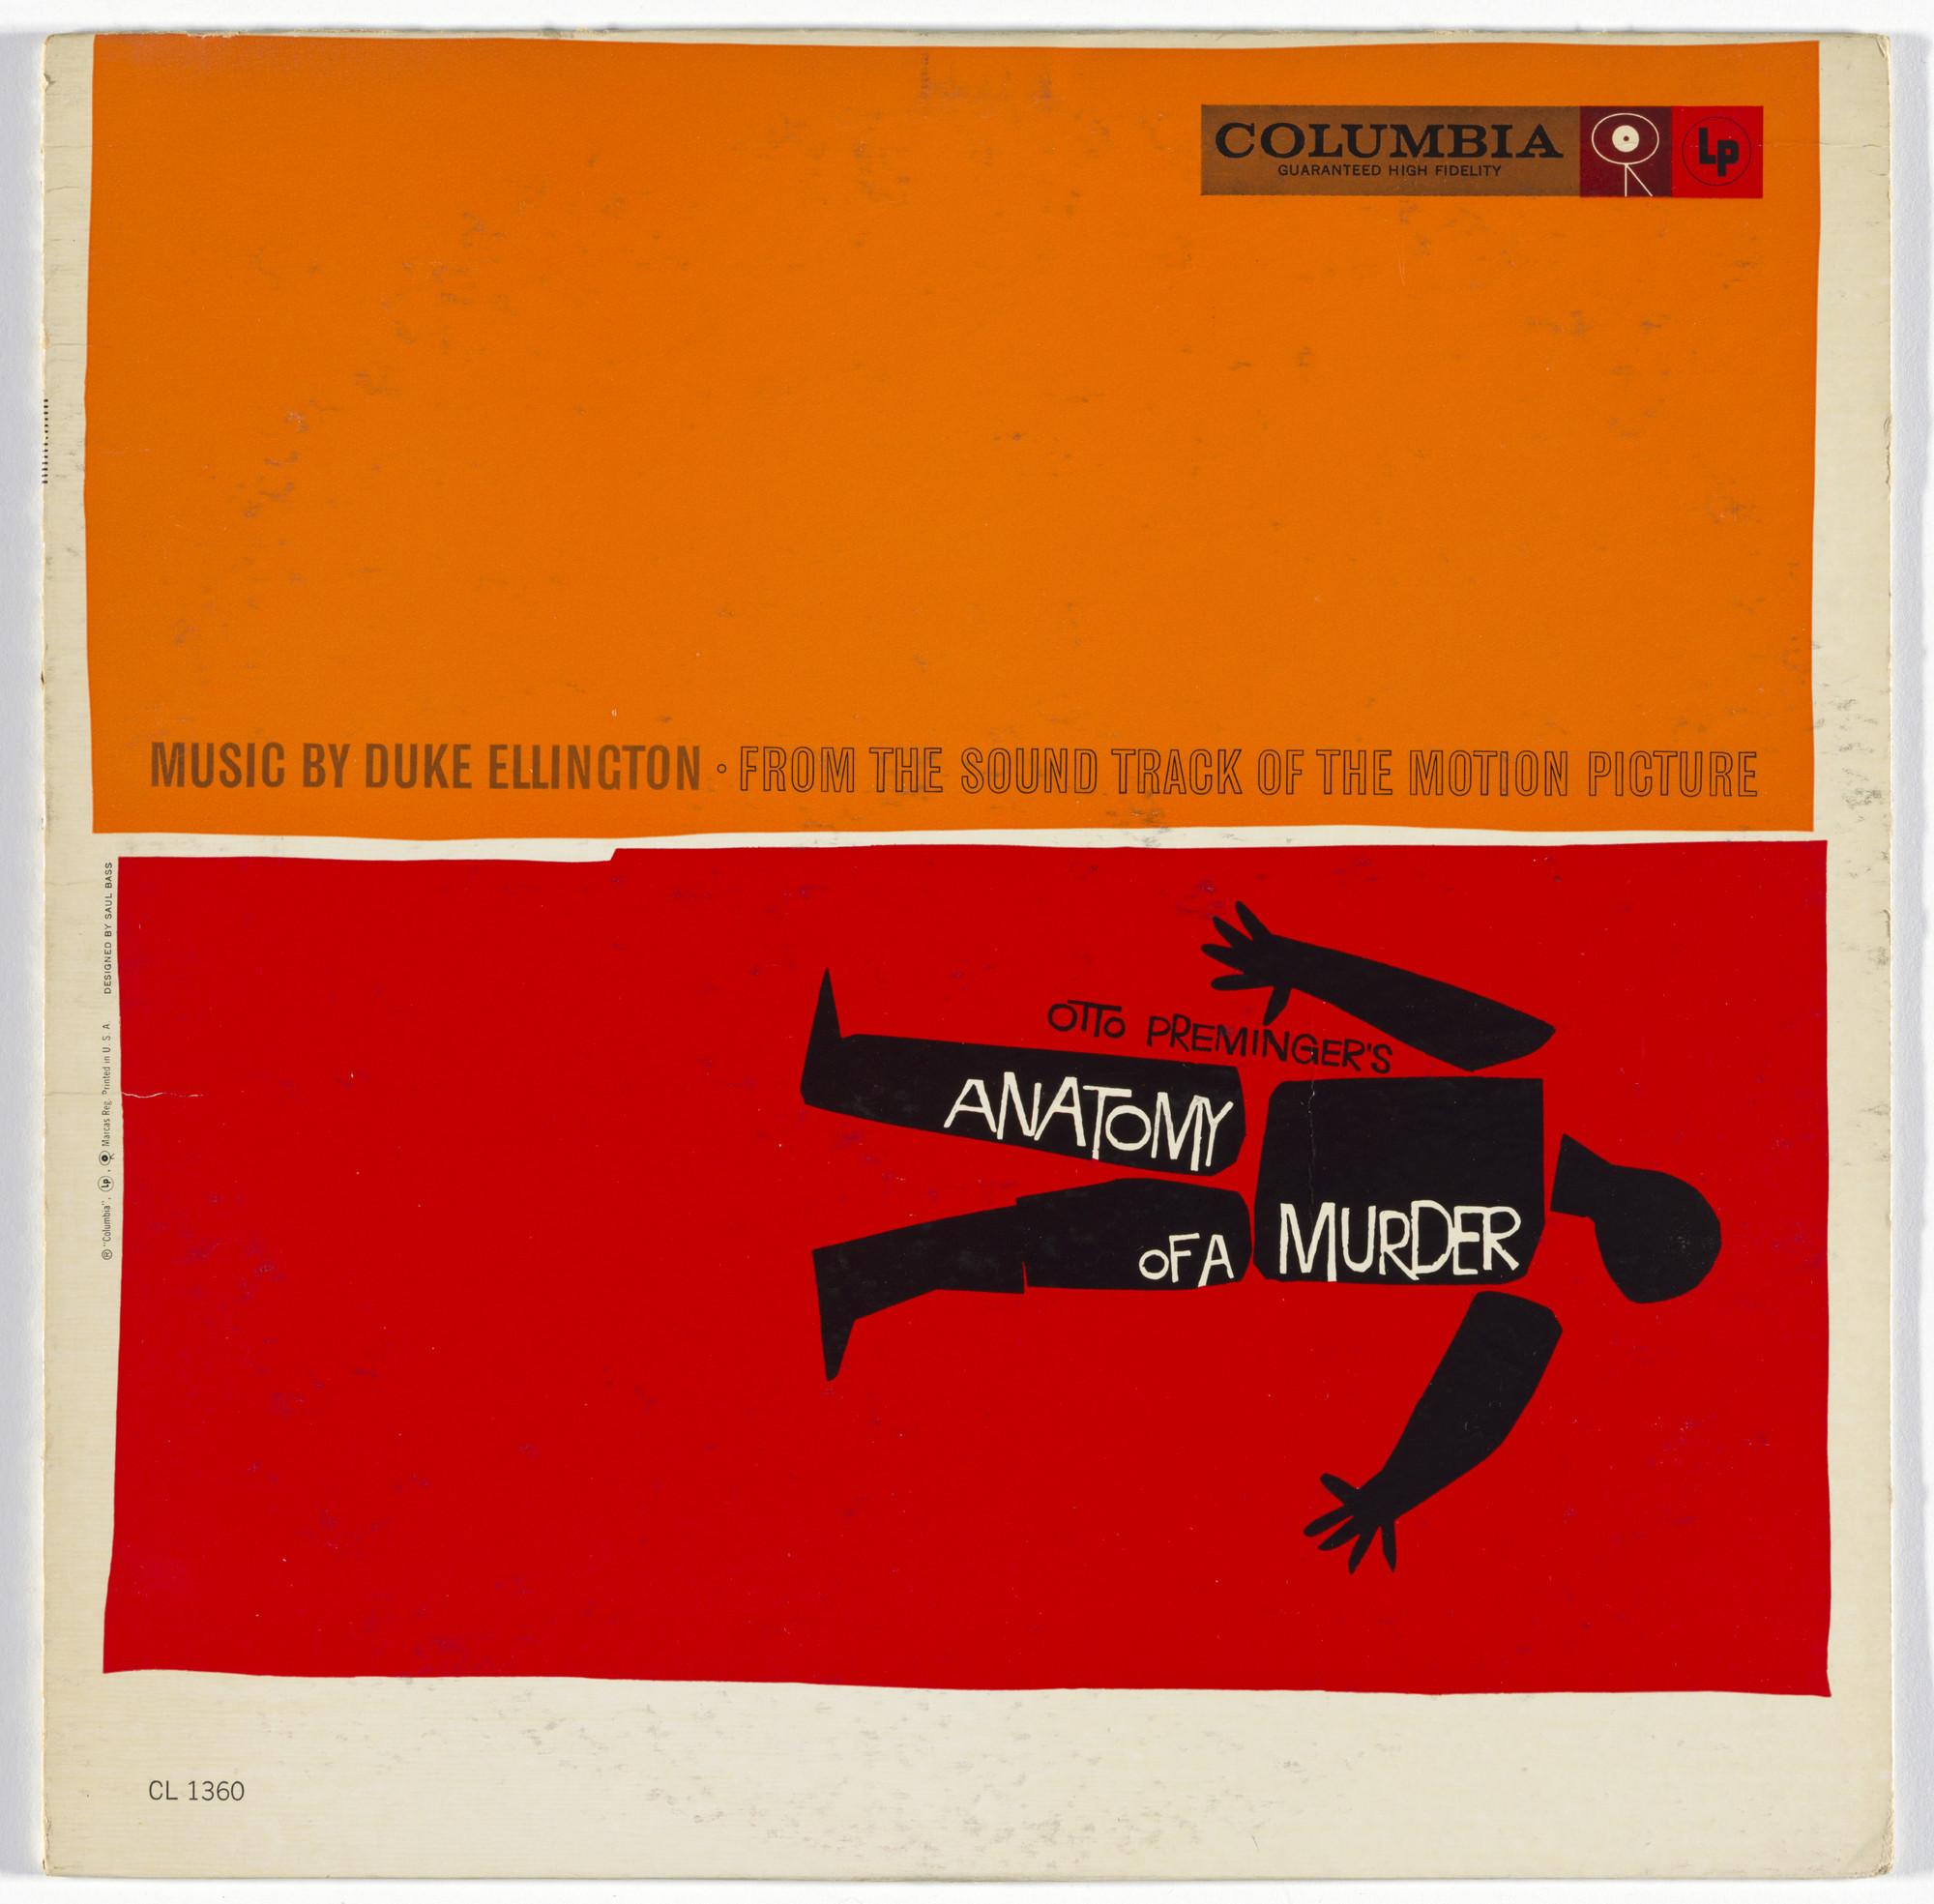 Saul Bass, Duke Ellington, Columbia Records  Album cover for Duke